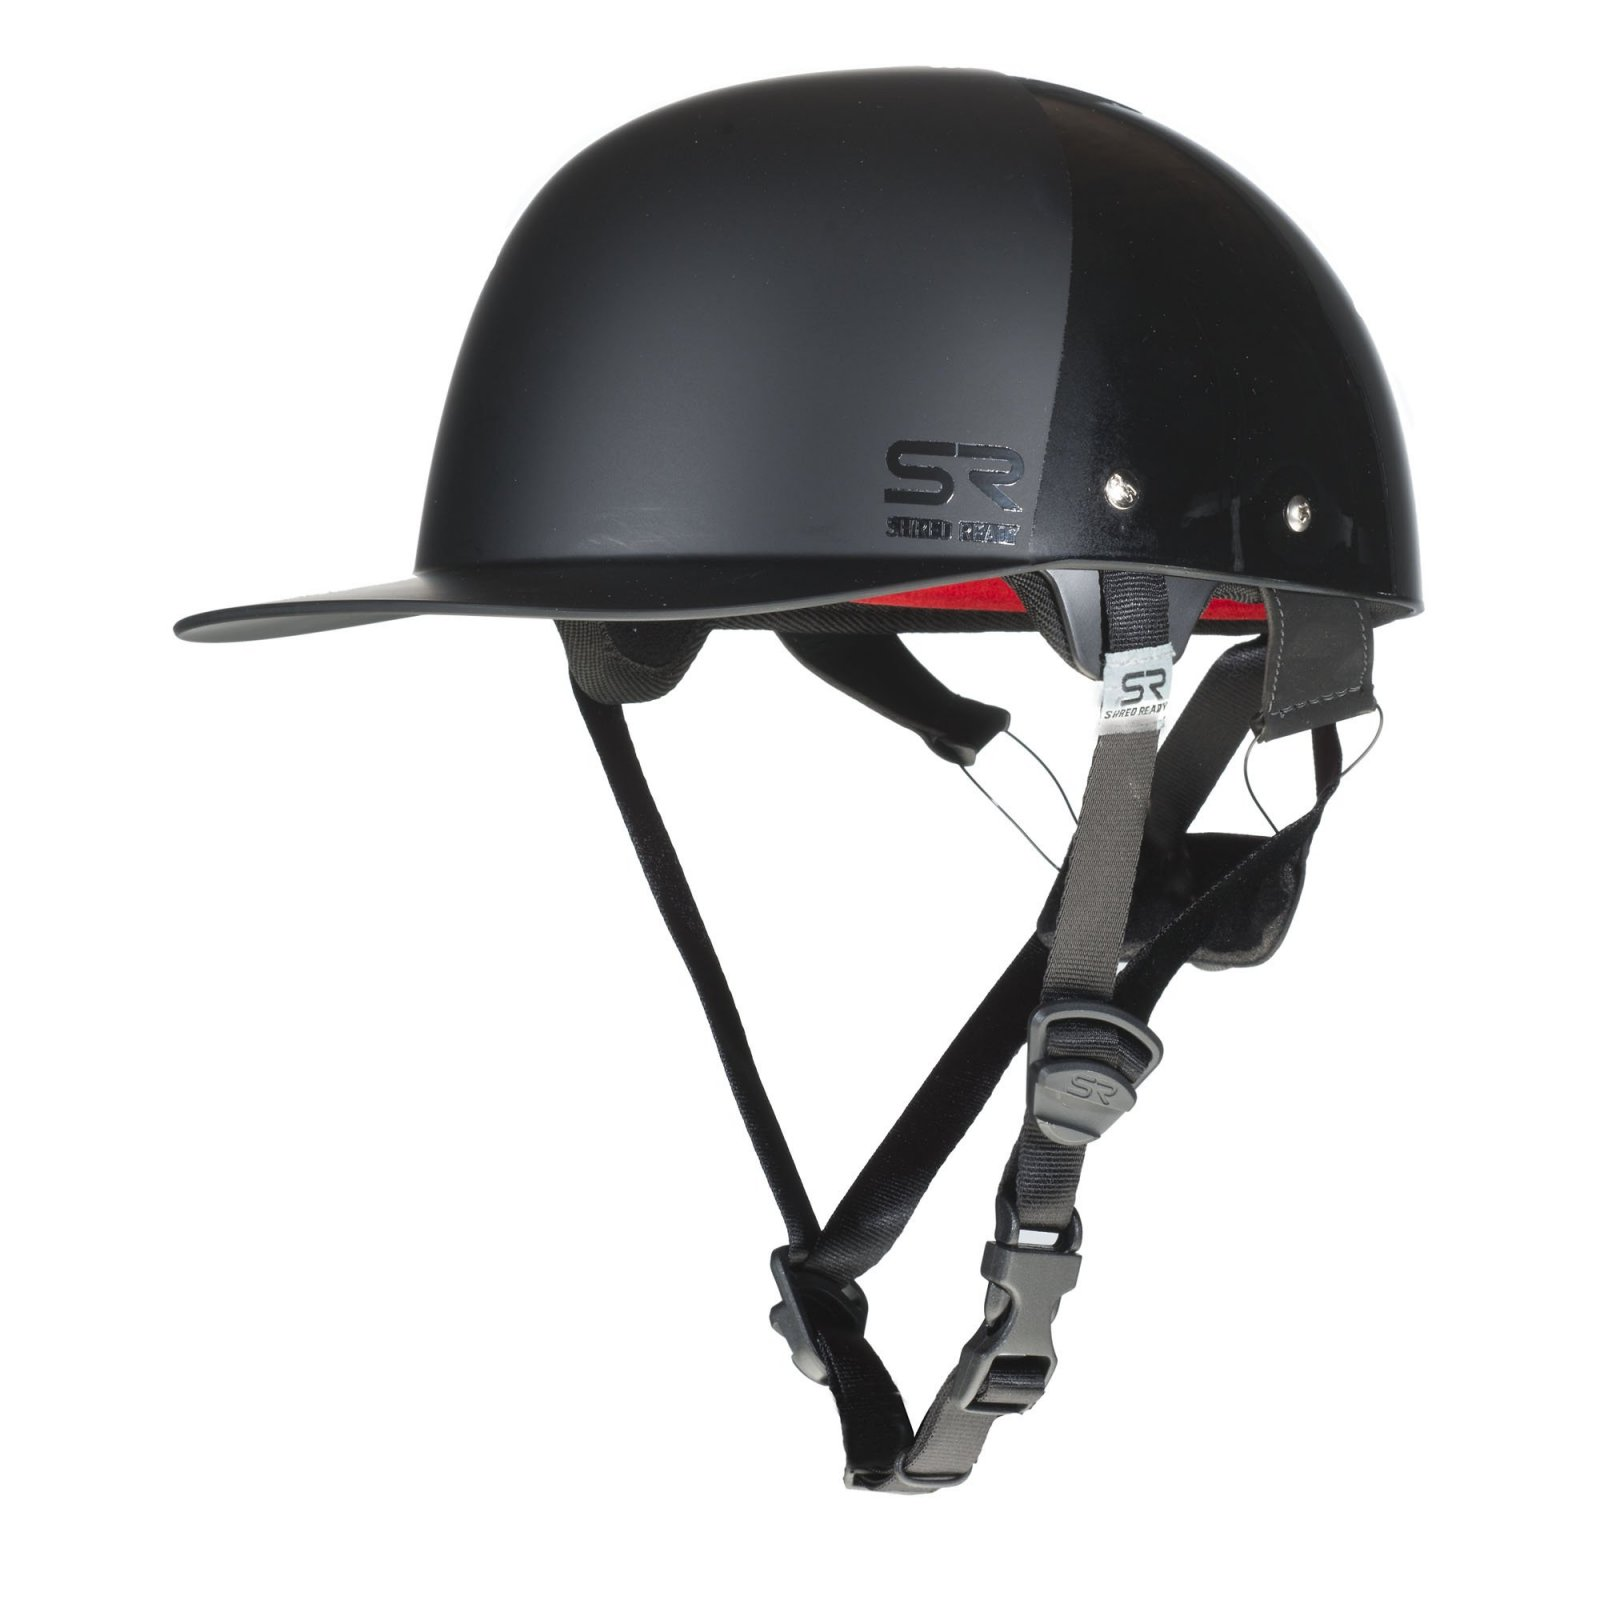 Shred Ready ZETA Helmet